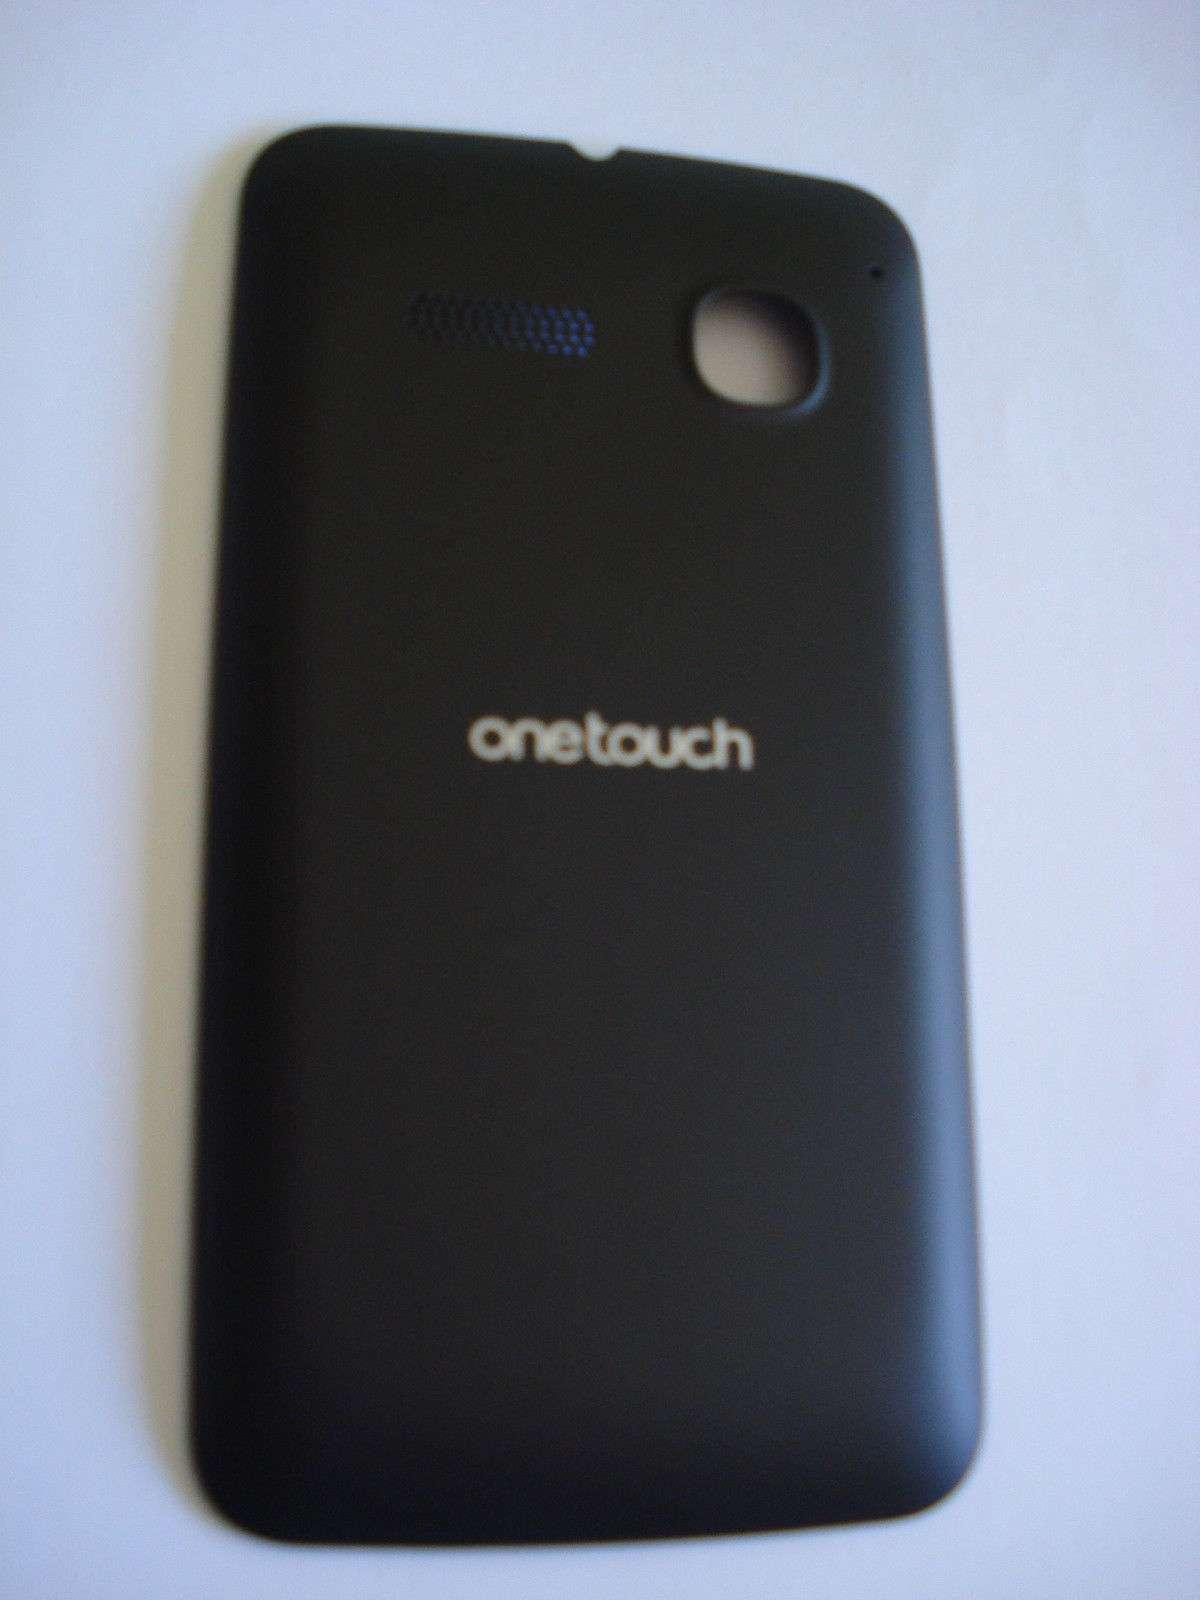 One Touch S Pop Dual Premium Batería Para Alcatel One Touch S Pop Ot-4030 Nuevo